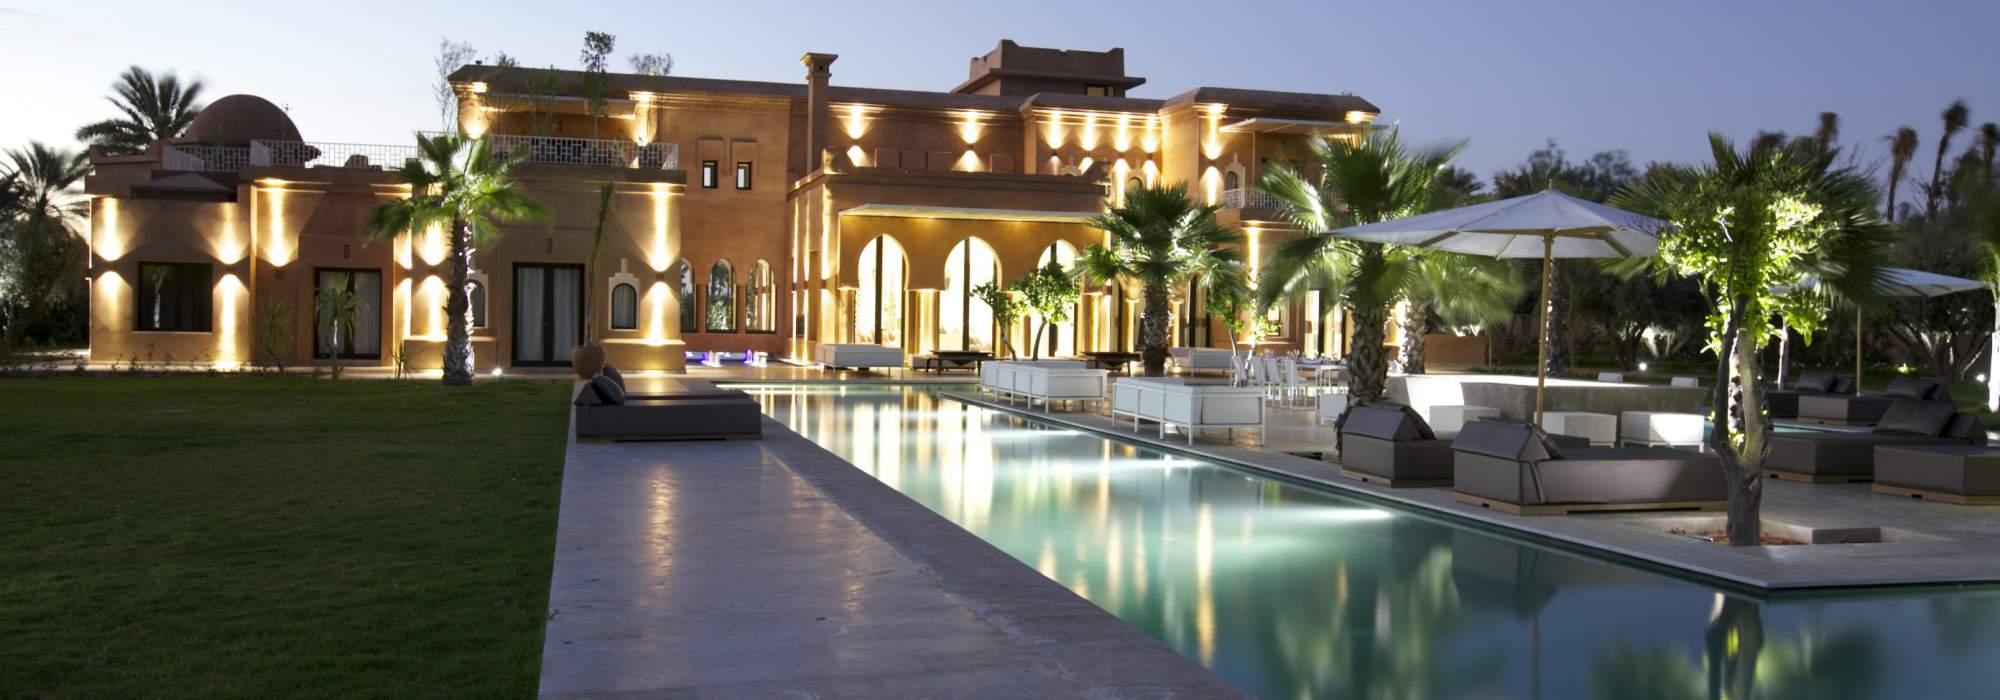 luxe villa a vendre palmeraie marrakech